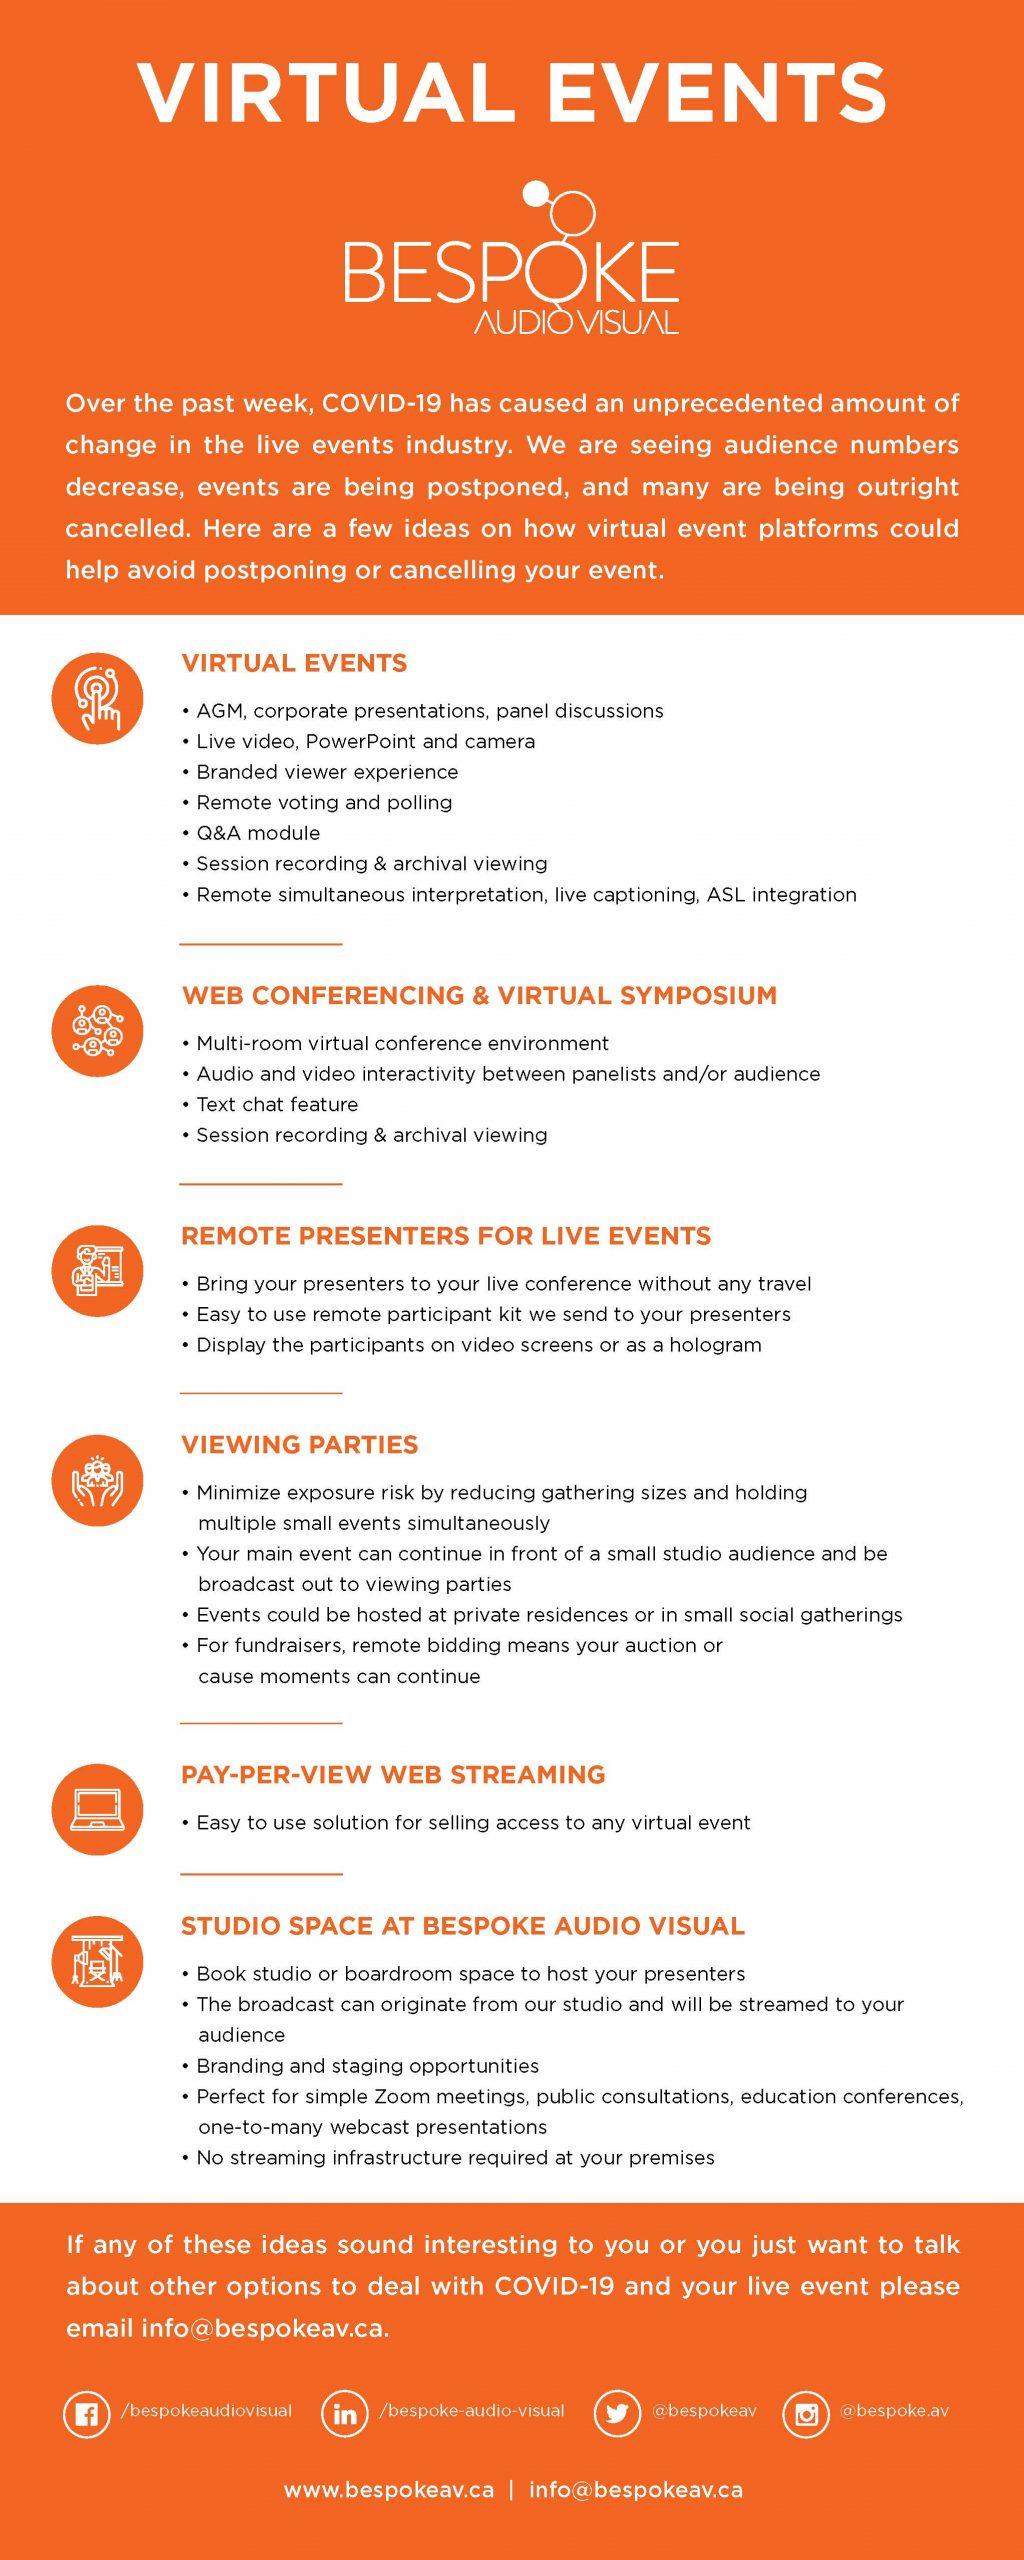 Bespoke Audio VIsual Virtual Events